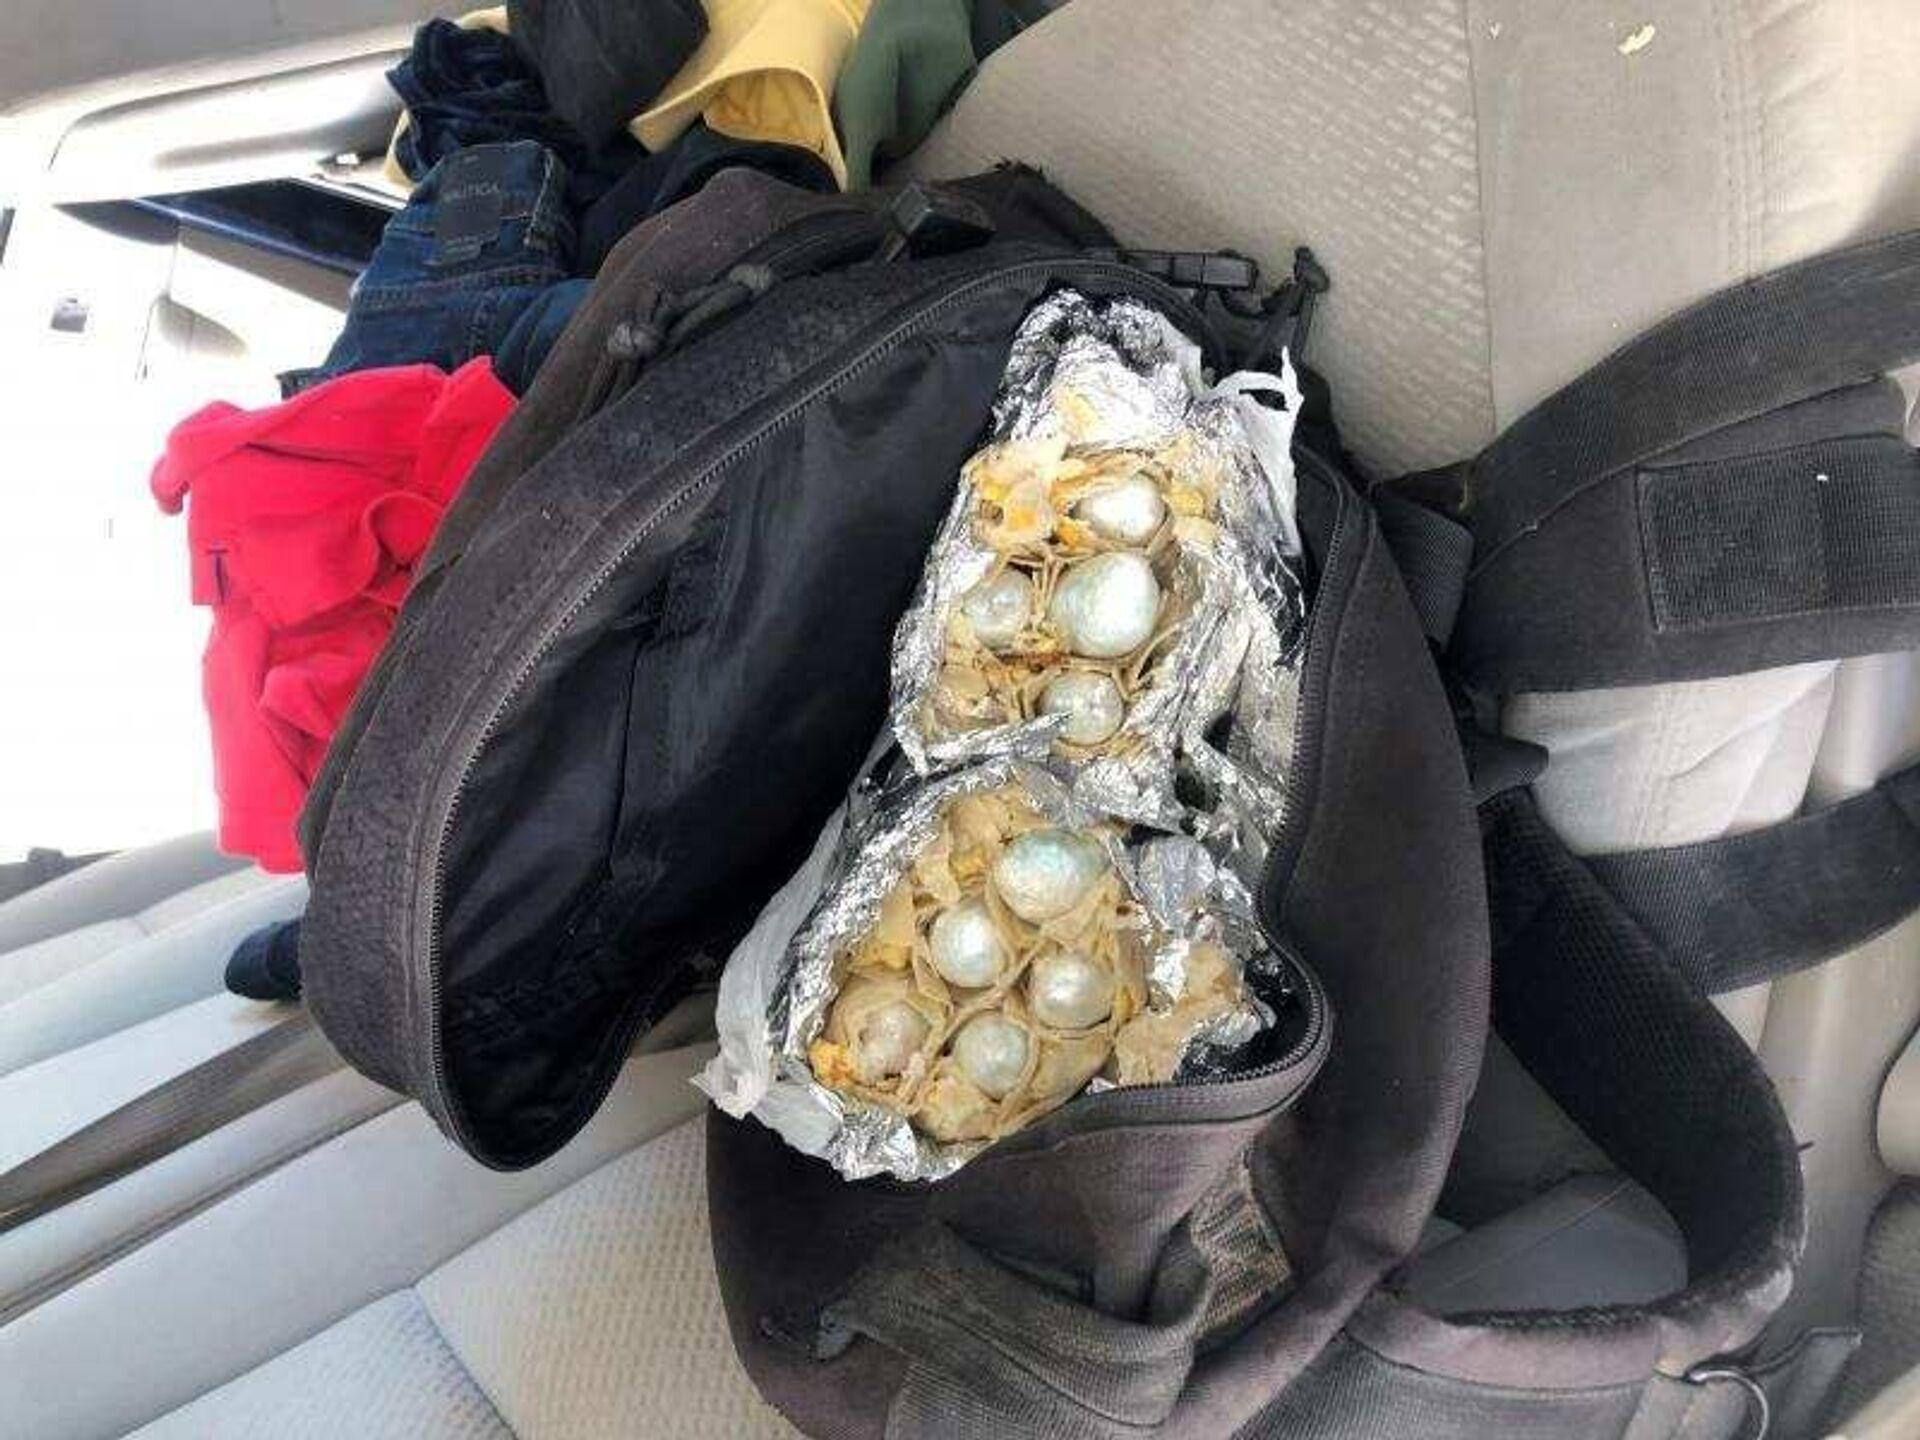 That's a Wrap: CBP Canine Sniffs Out $60K Worth of Fentanyl Stuffed in Burritos - Photo - Sputnik International, 1920, 31.03.2021